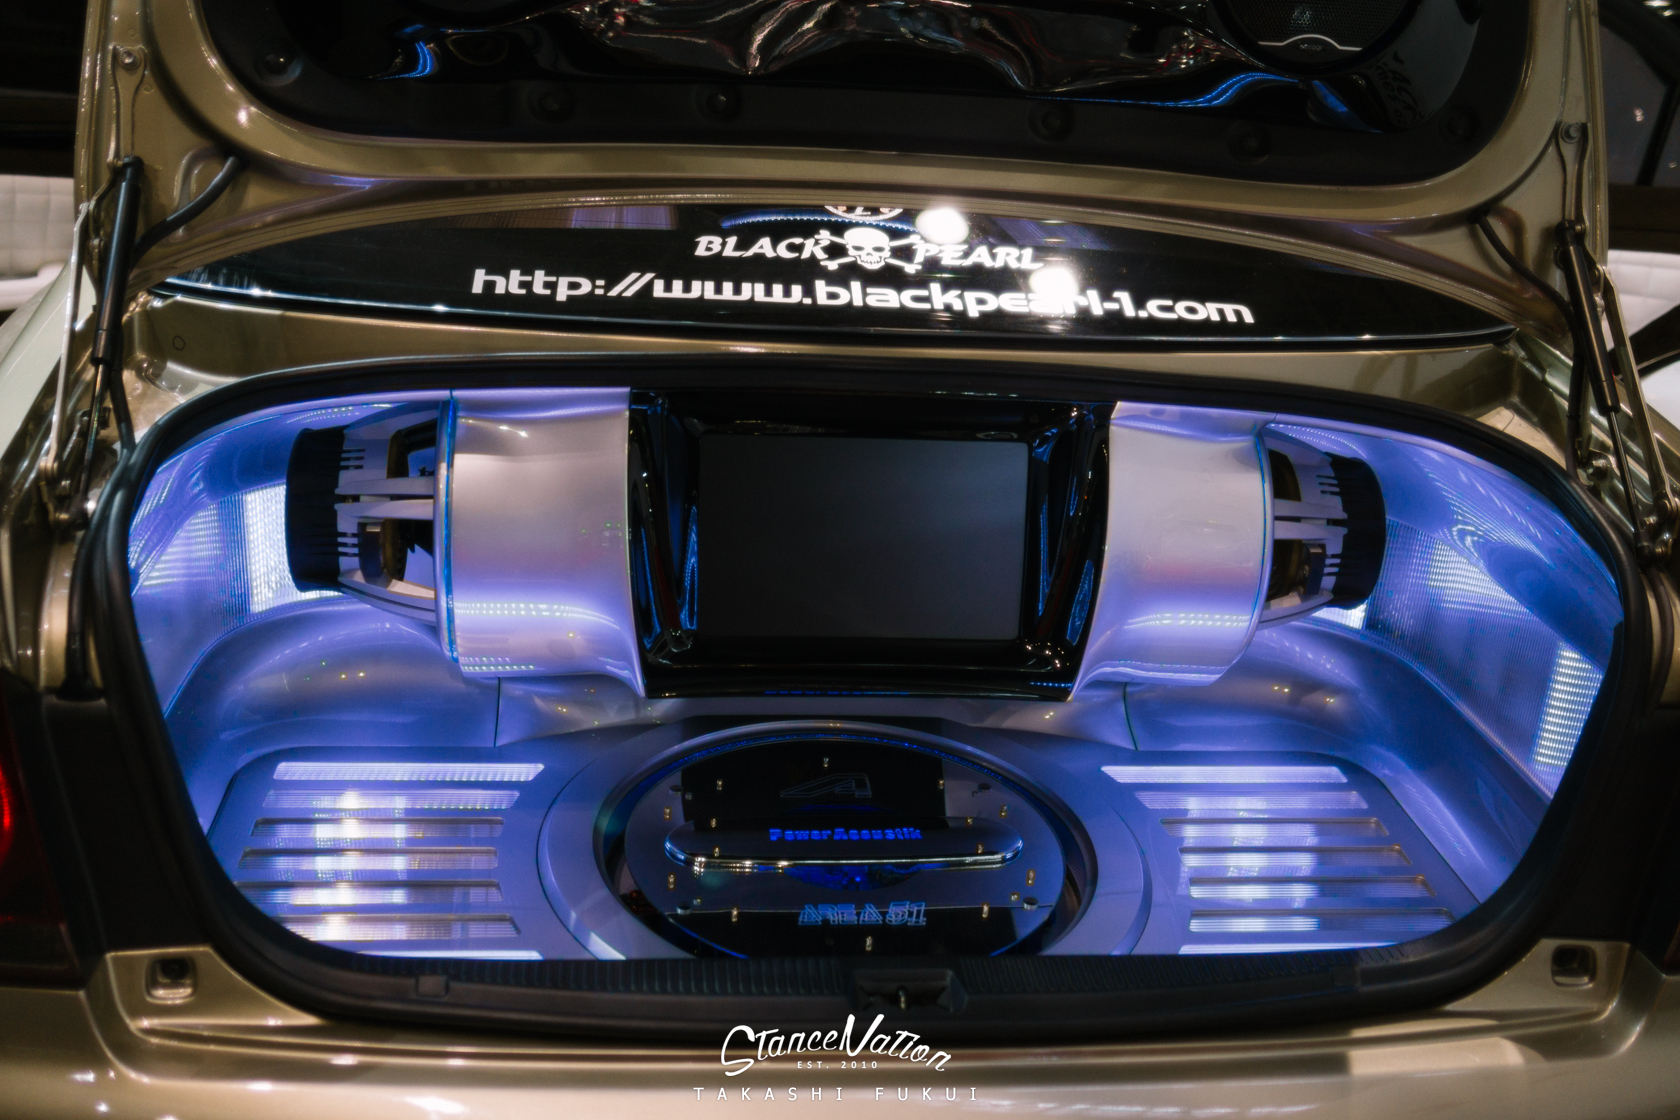 osaka auto messe 2014 photo coverage-127